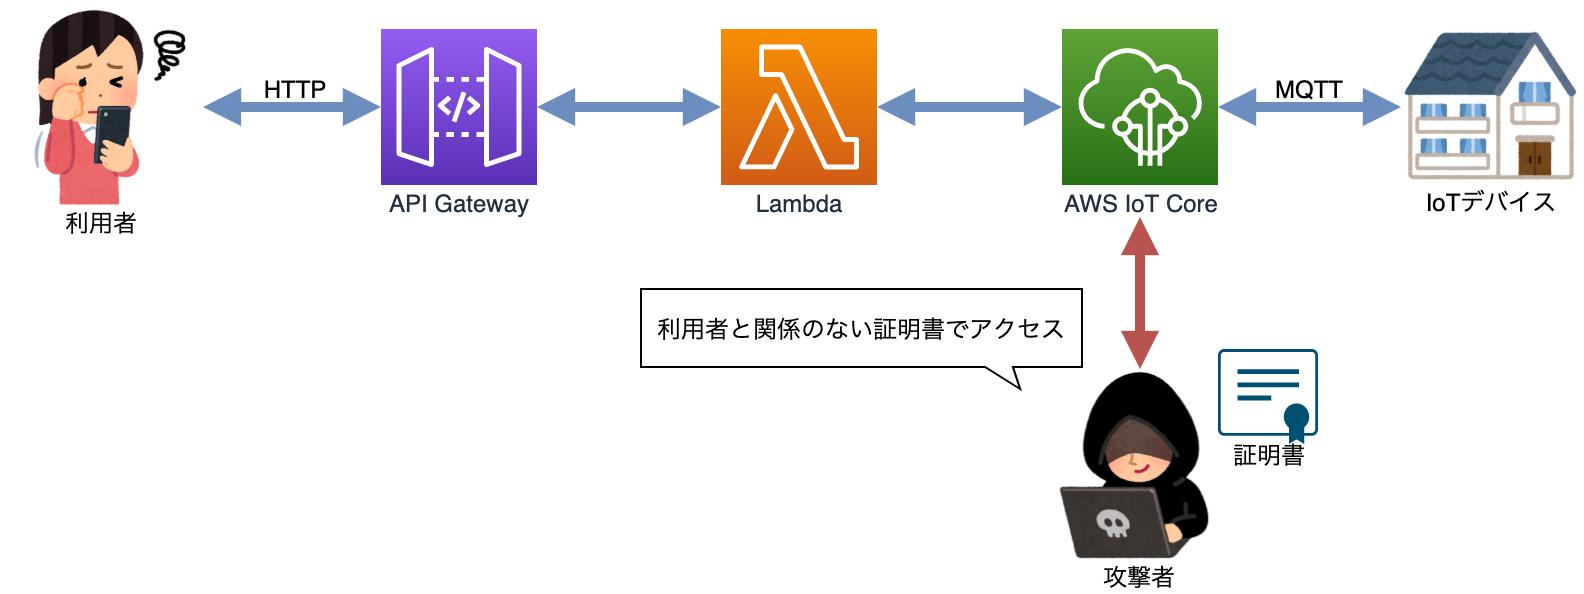 AWS IoT Core 攻撃